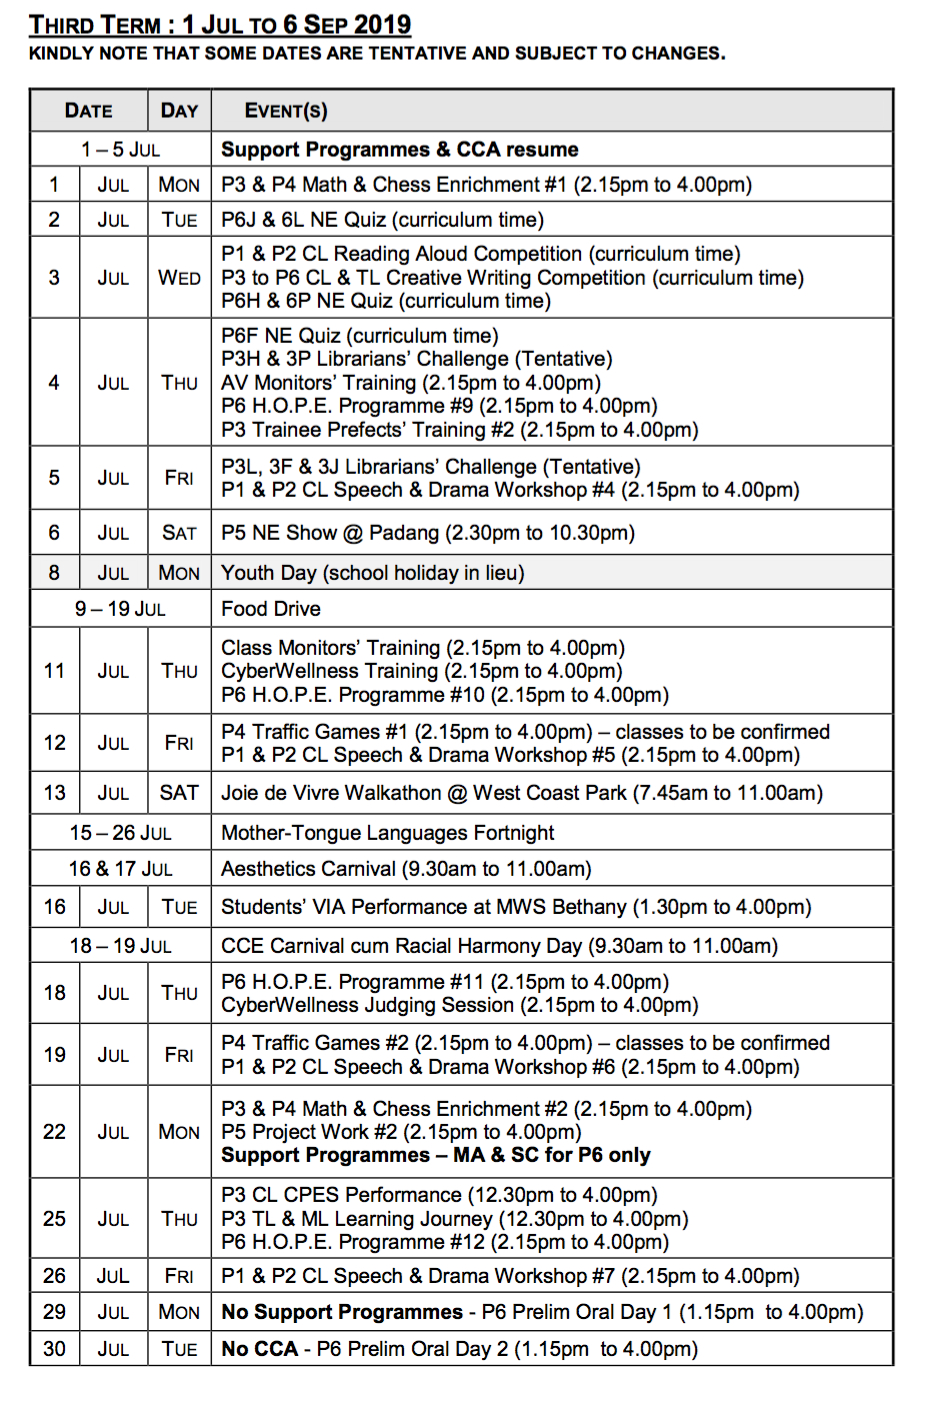 School Calendar with Third Term School Calendar